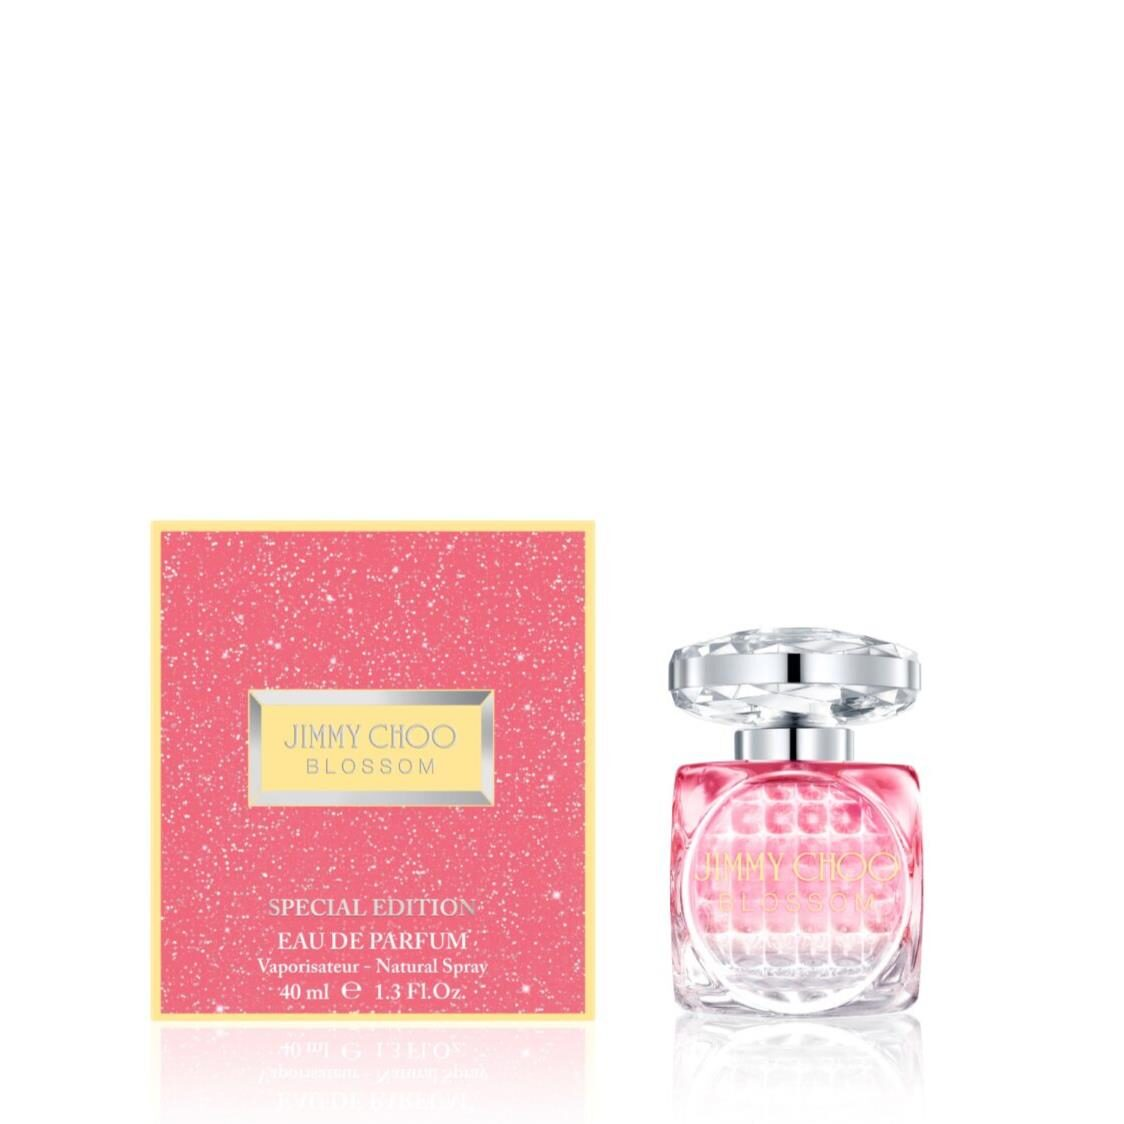 Jimmy Choo Blossom Special Edition EDP 40ml